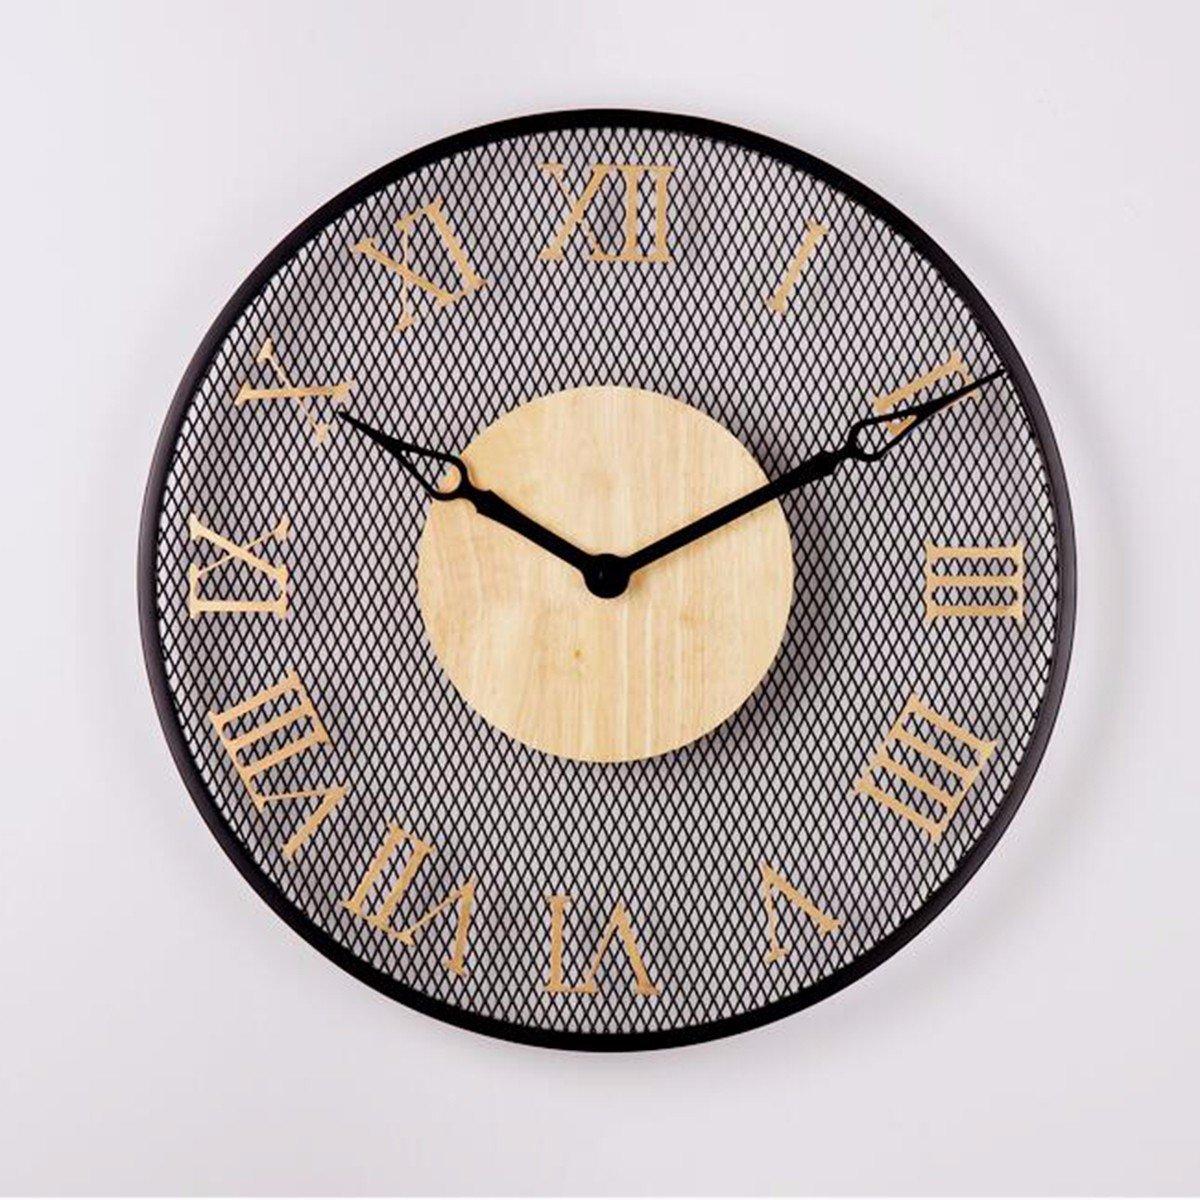 Amazon.com: Wall Clocks Modern minimalist dining room bedroom entrance round clock clock digital clock background wall air personality,B: Home & Kitchen